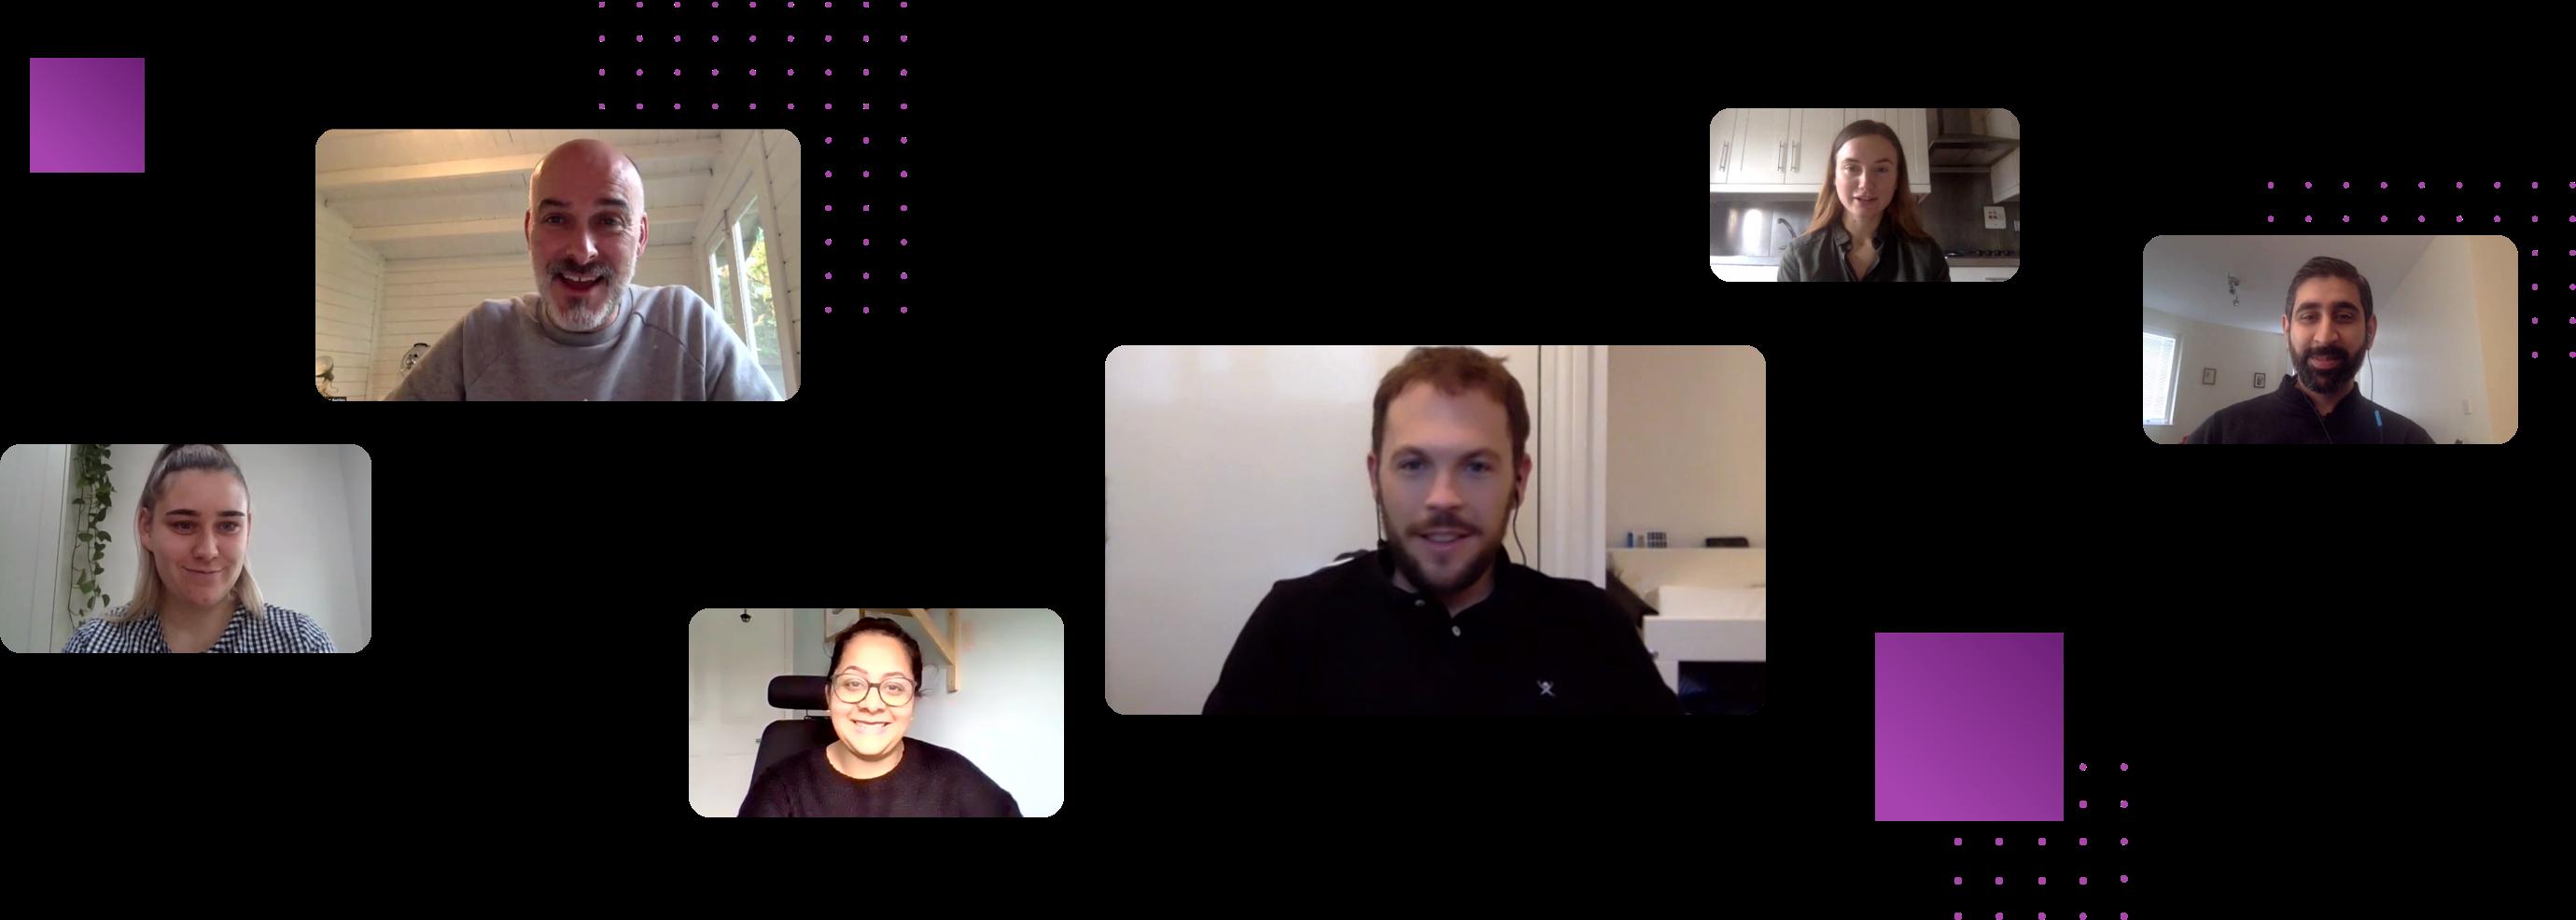 MySense Staff On A Video Call